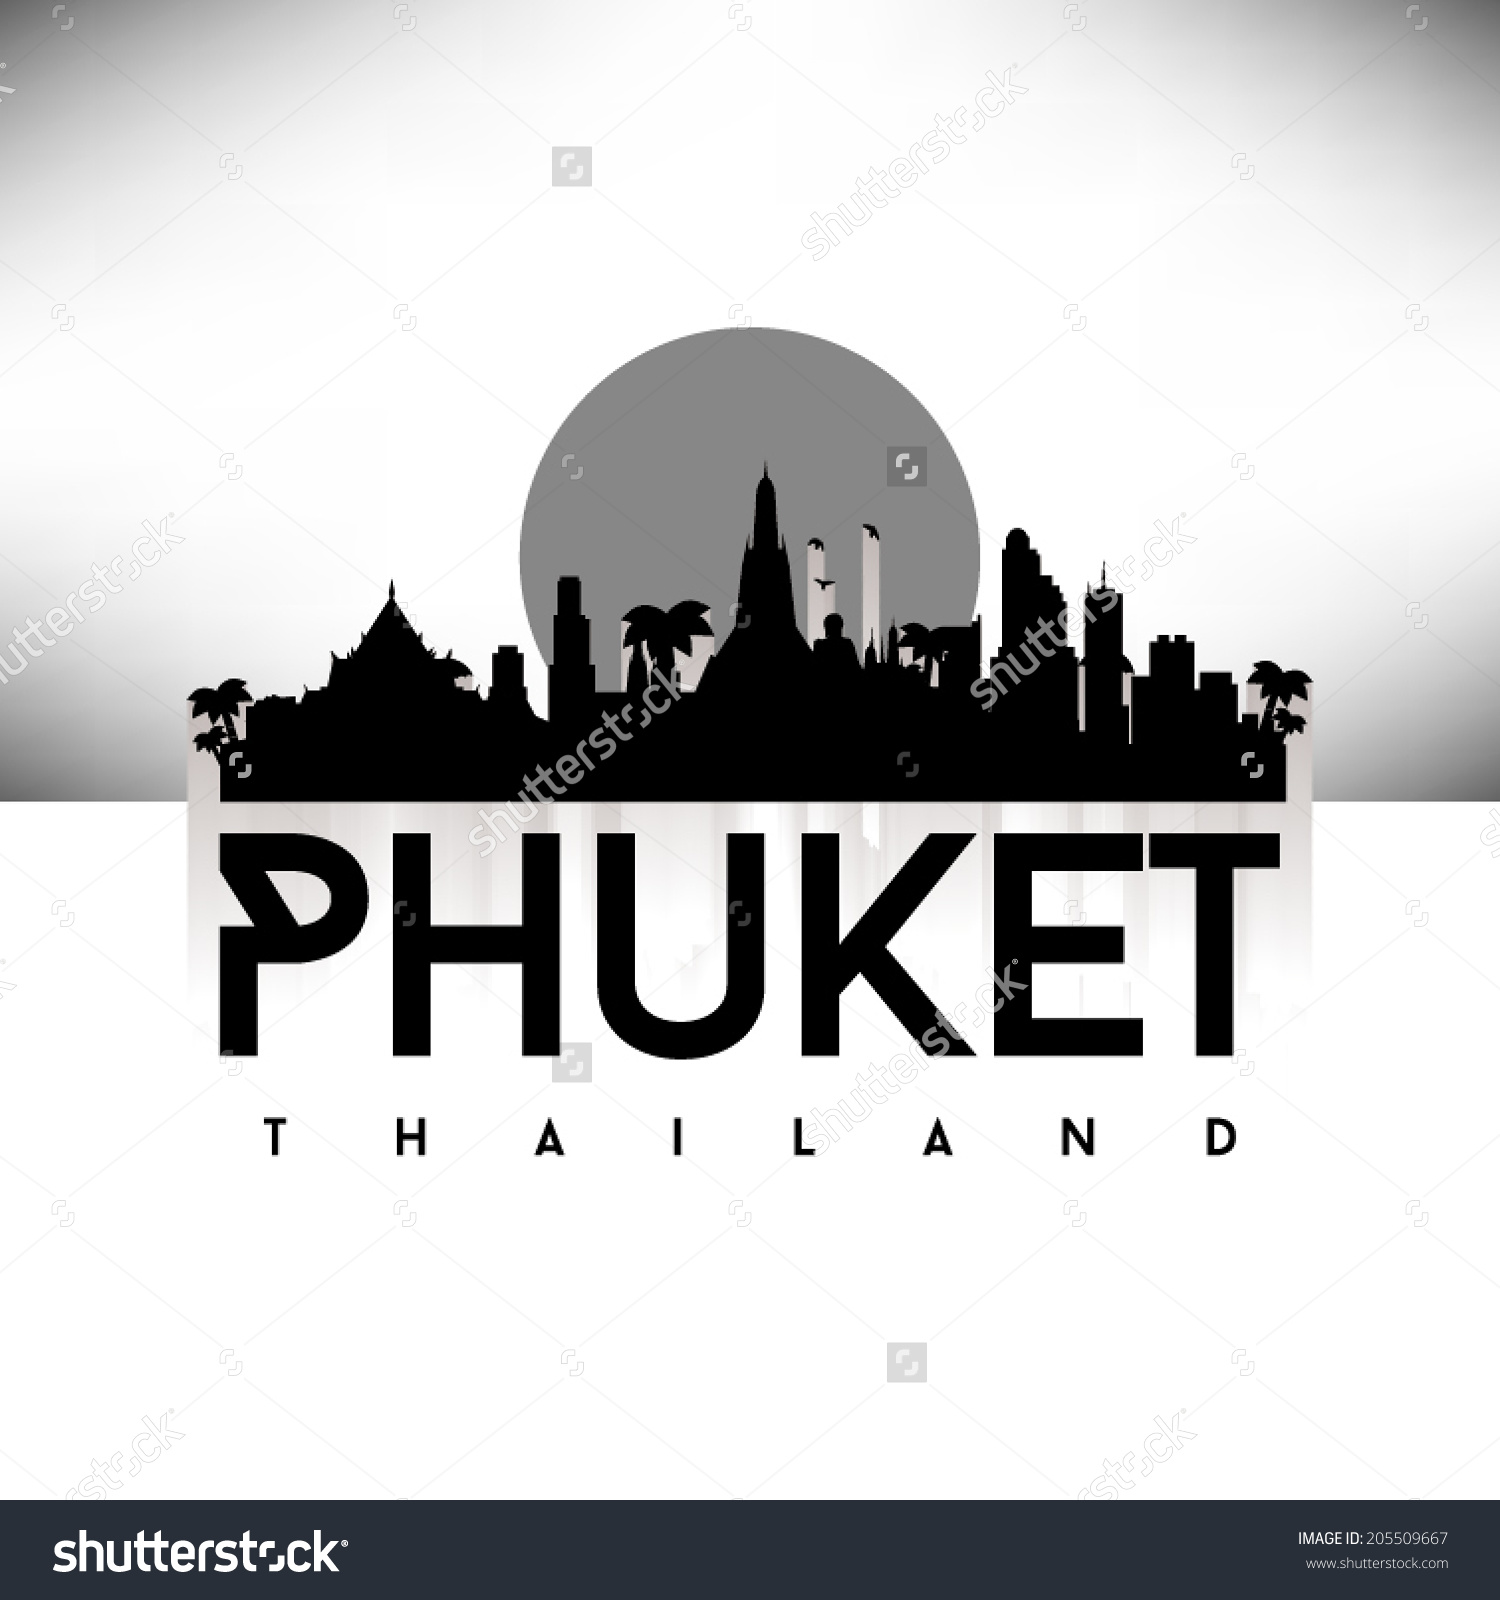 Phuket clipart #4, Download drawings